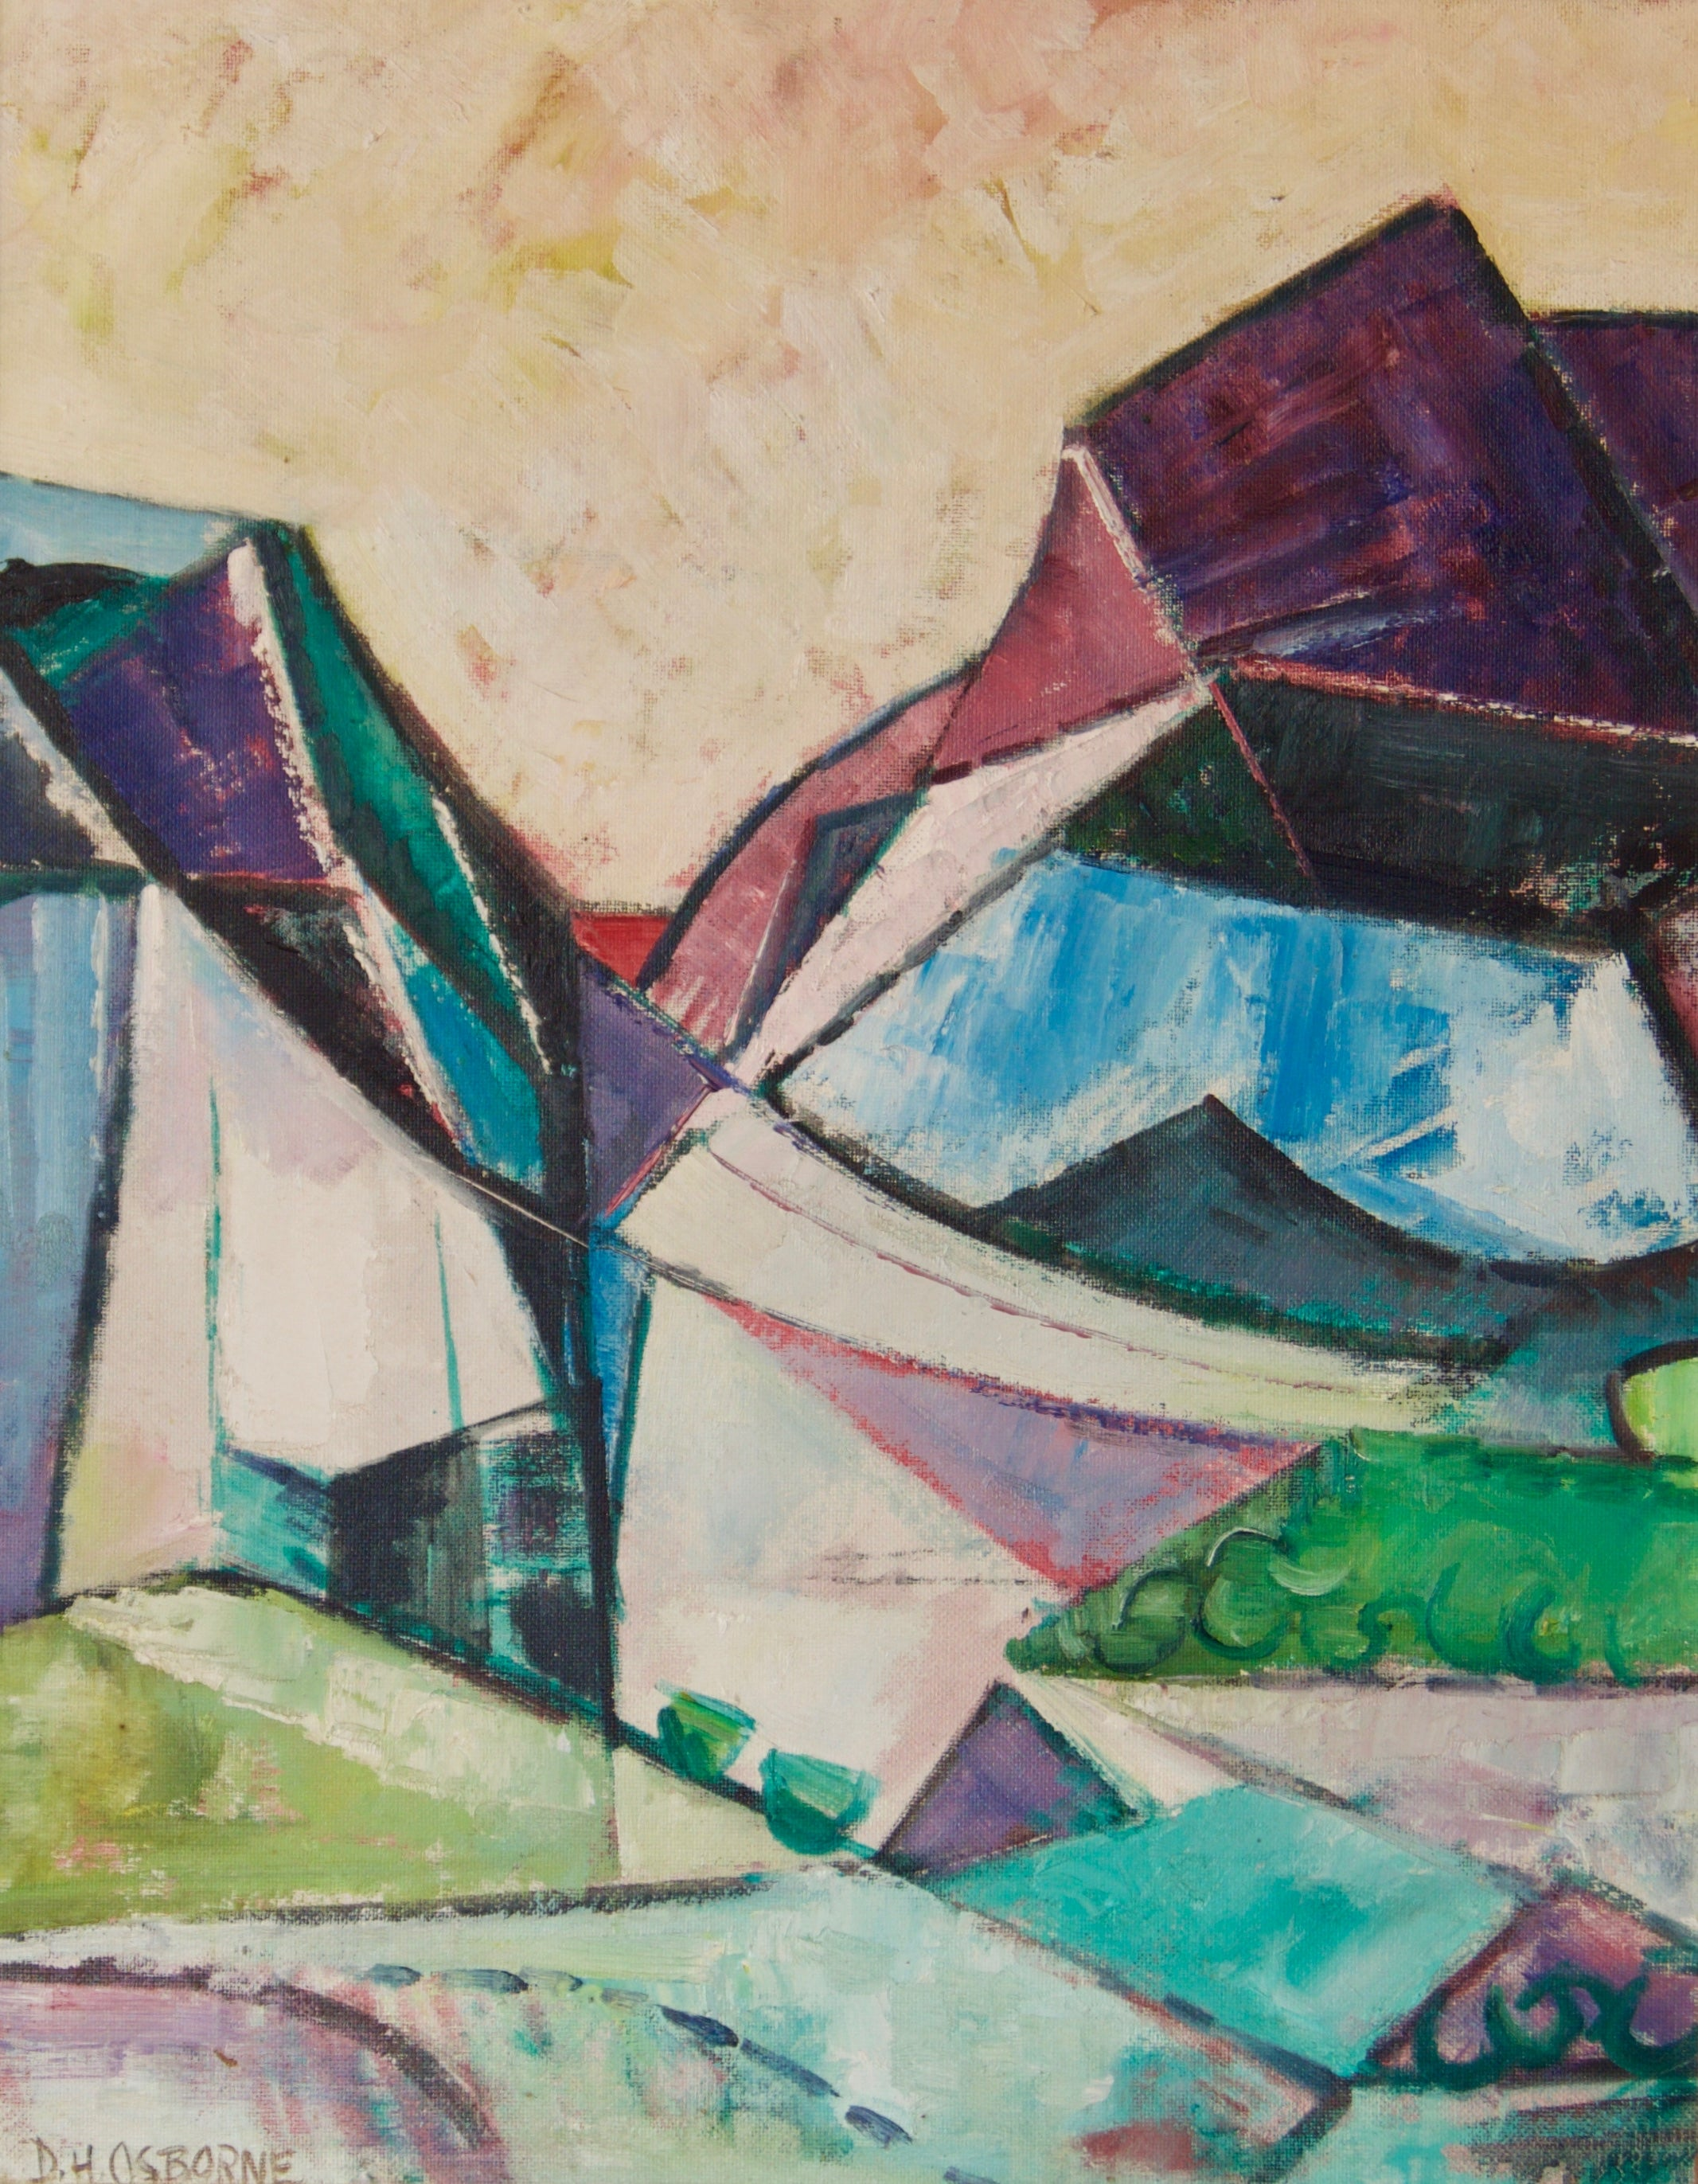 Abstract Landscape - Mid 20th Century Cubist Oil Piece - Dennis Henry Osborne